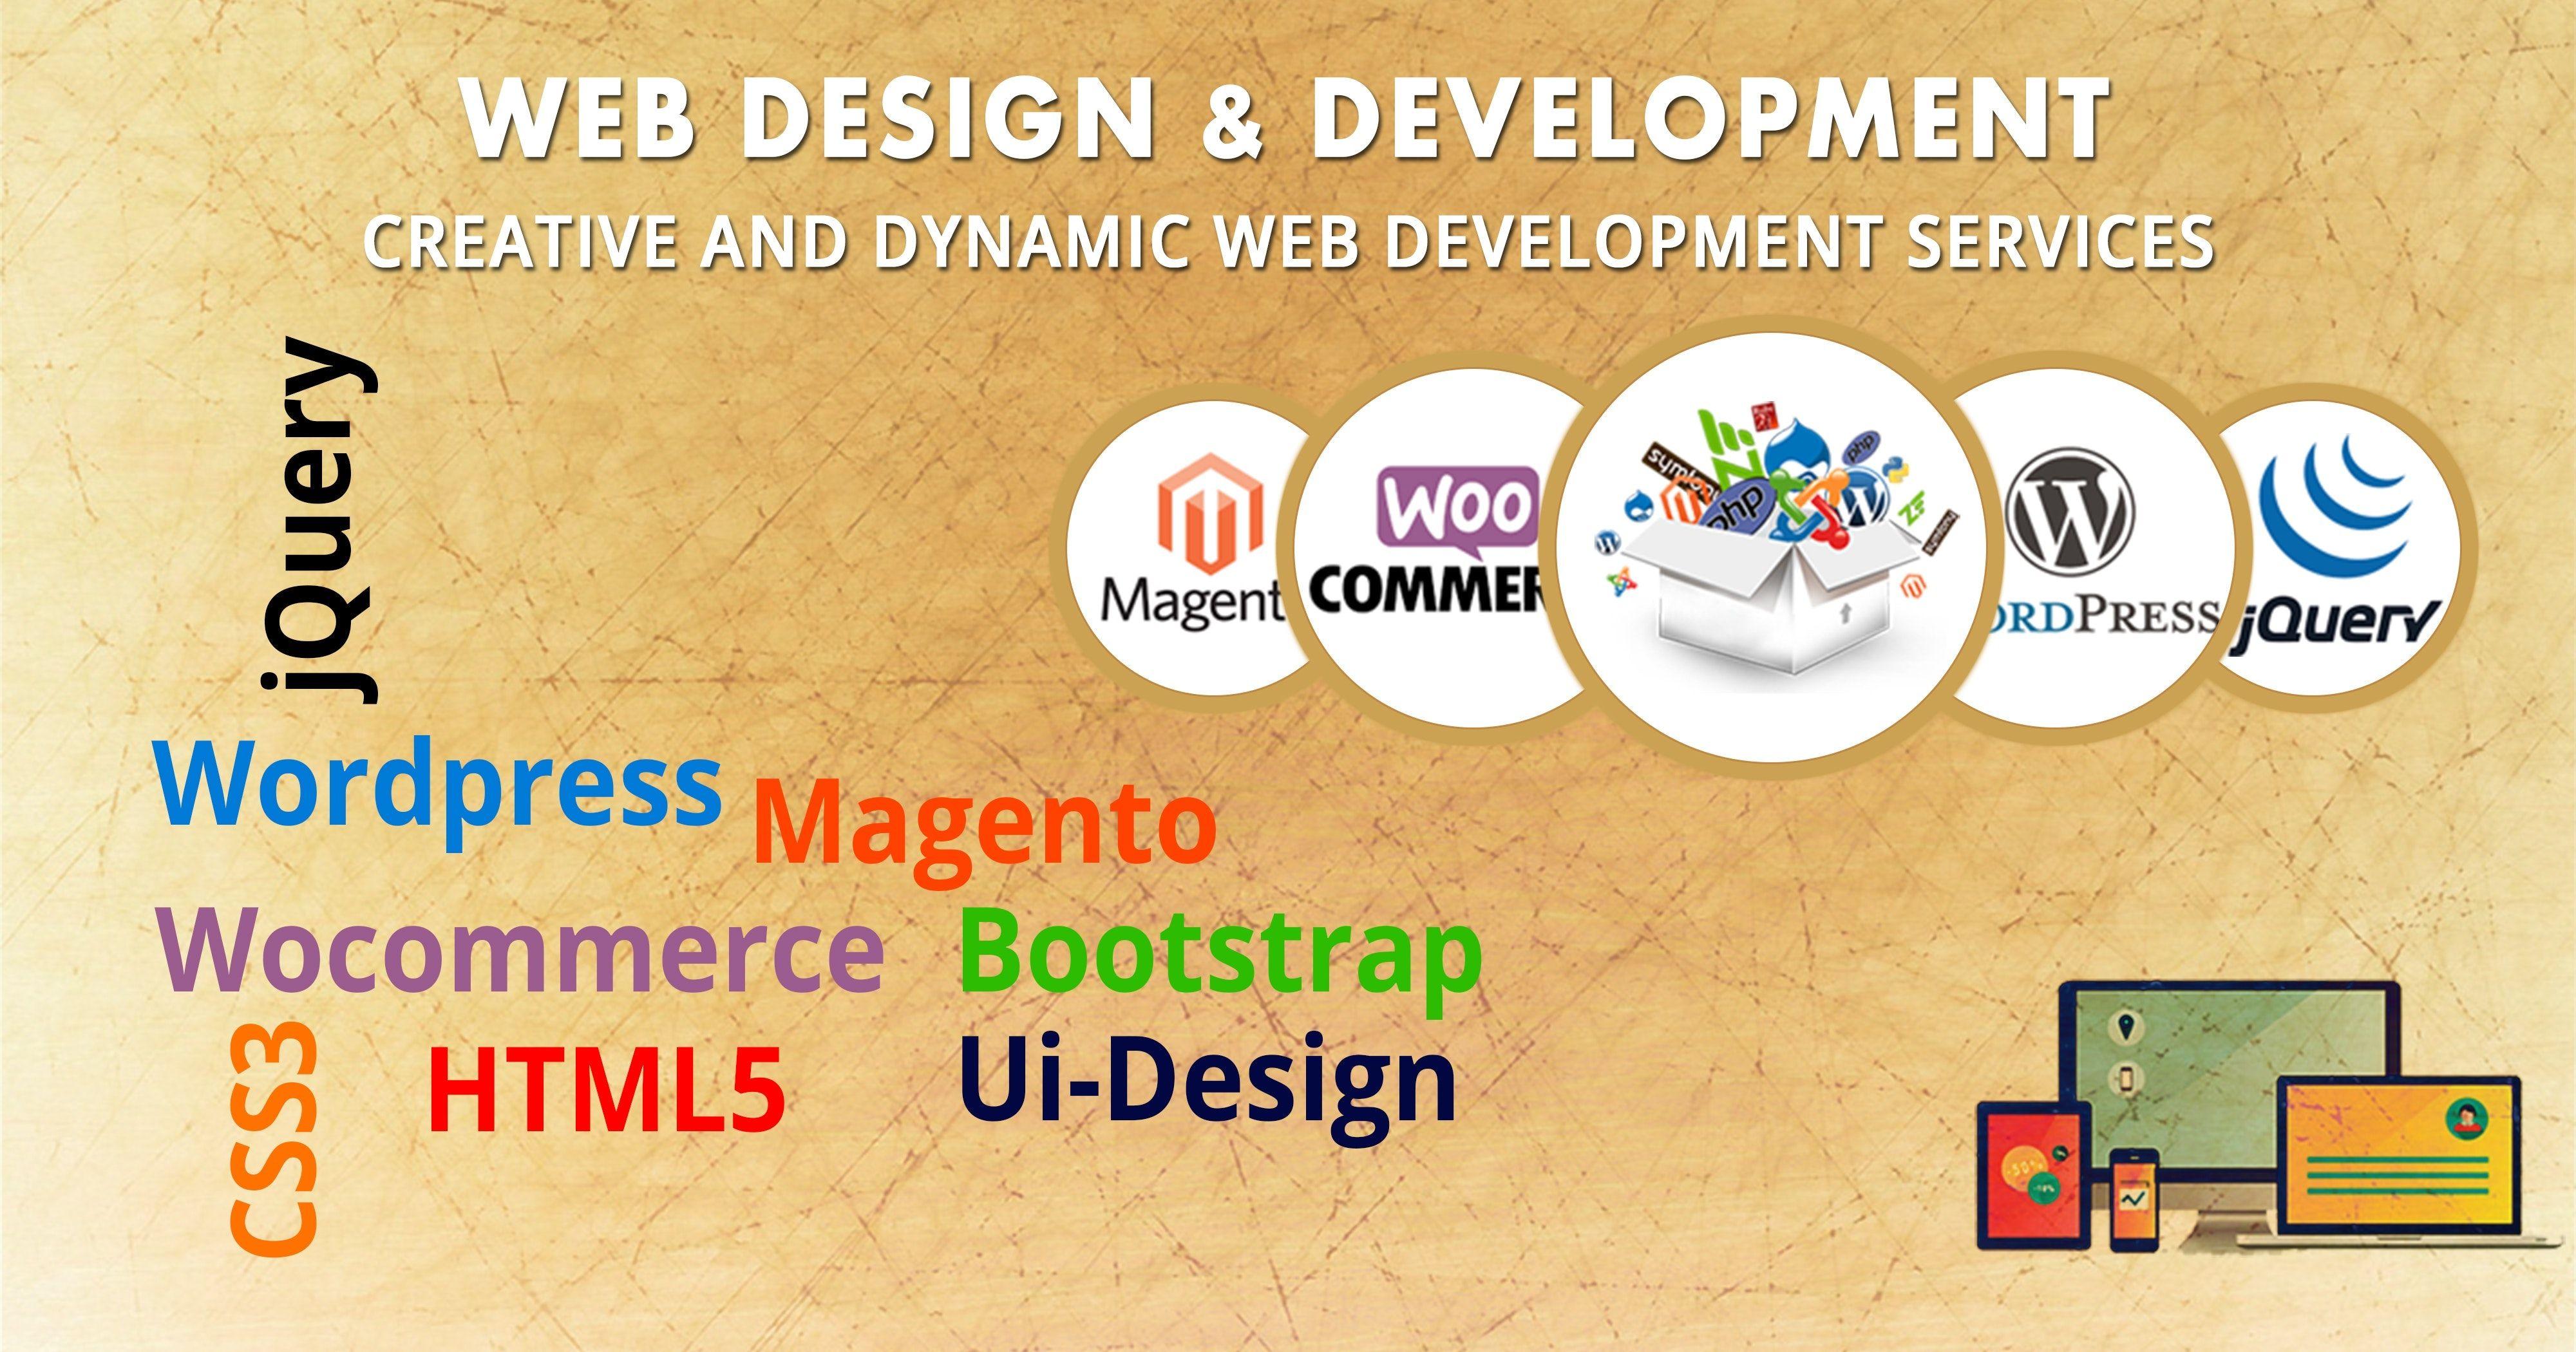 Web Design And Development Web Development Design Web Design Web Design Services